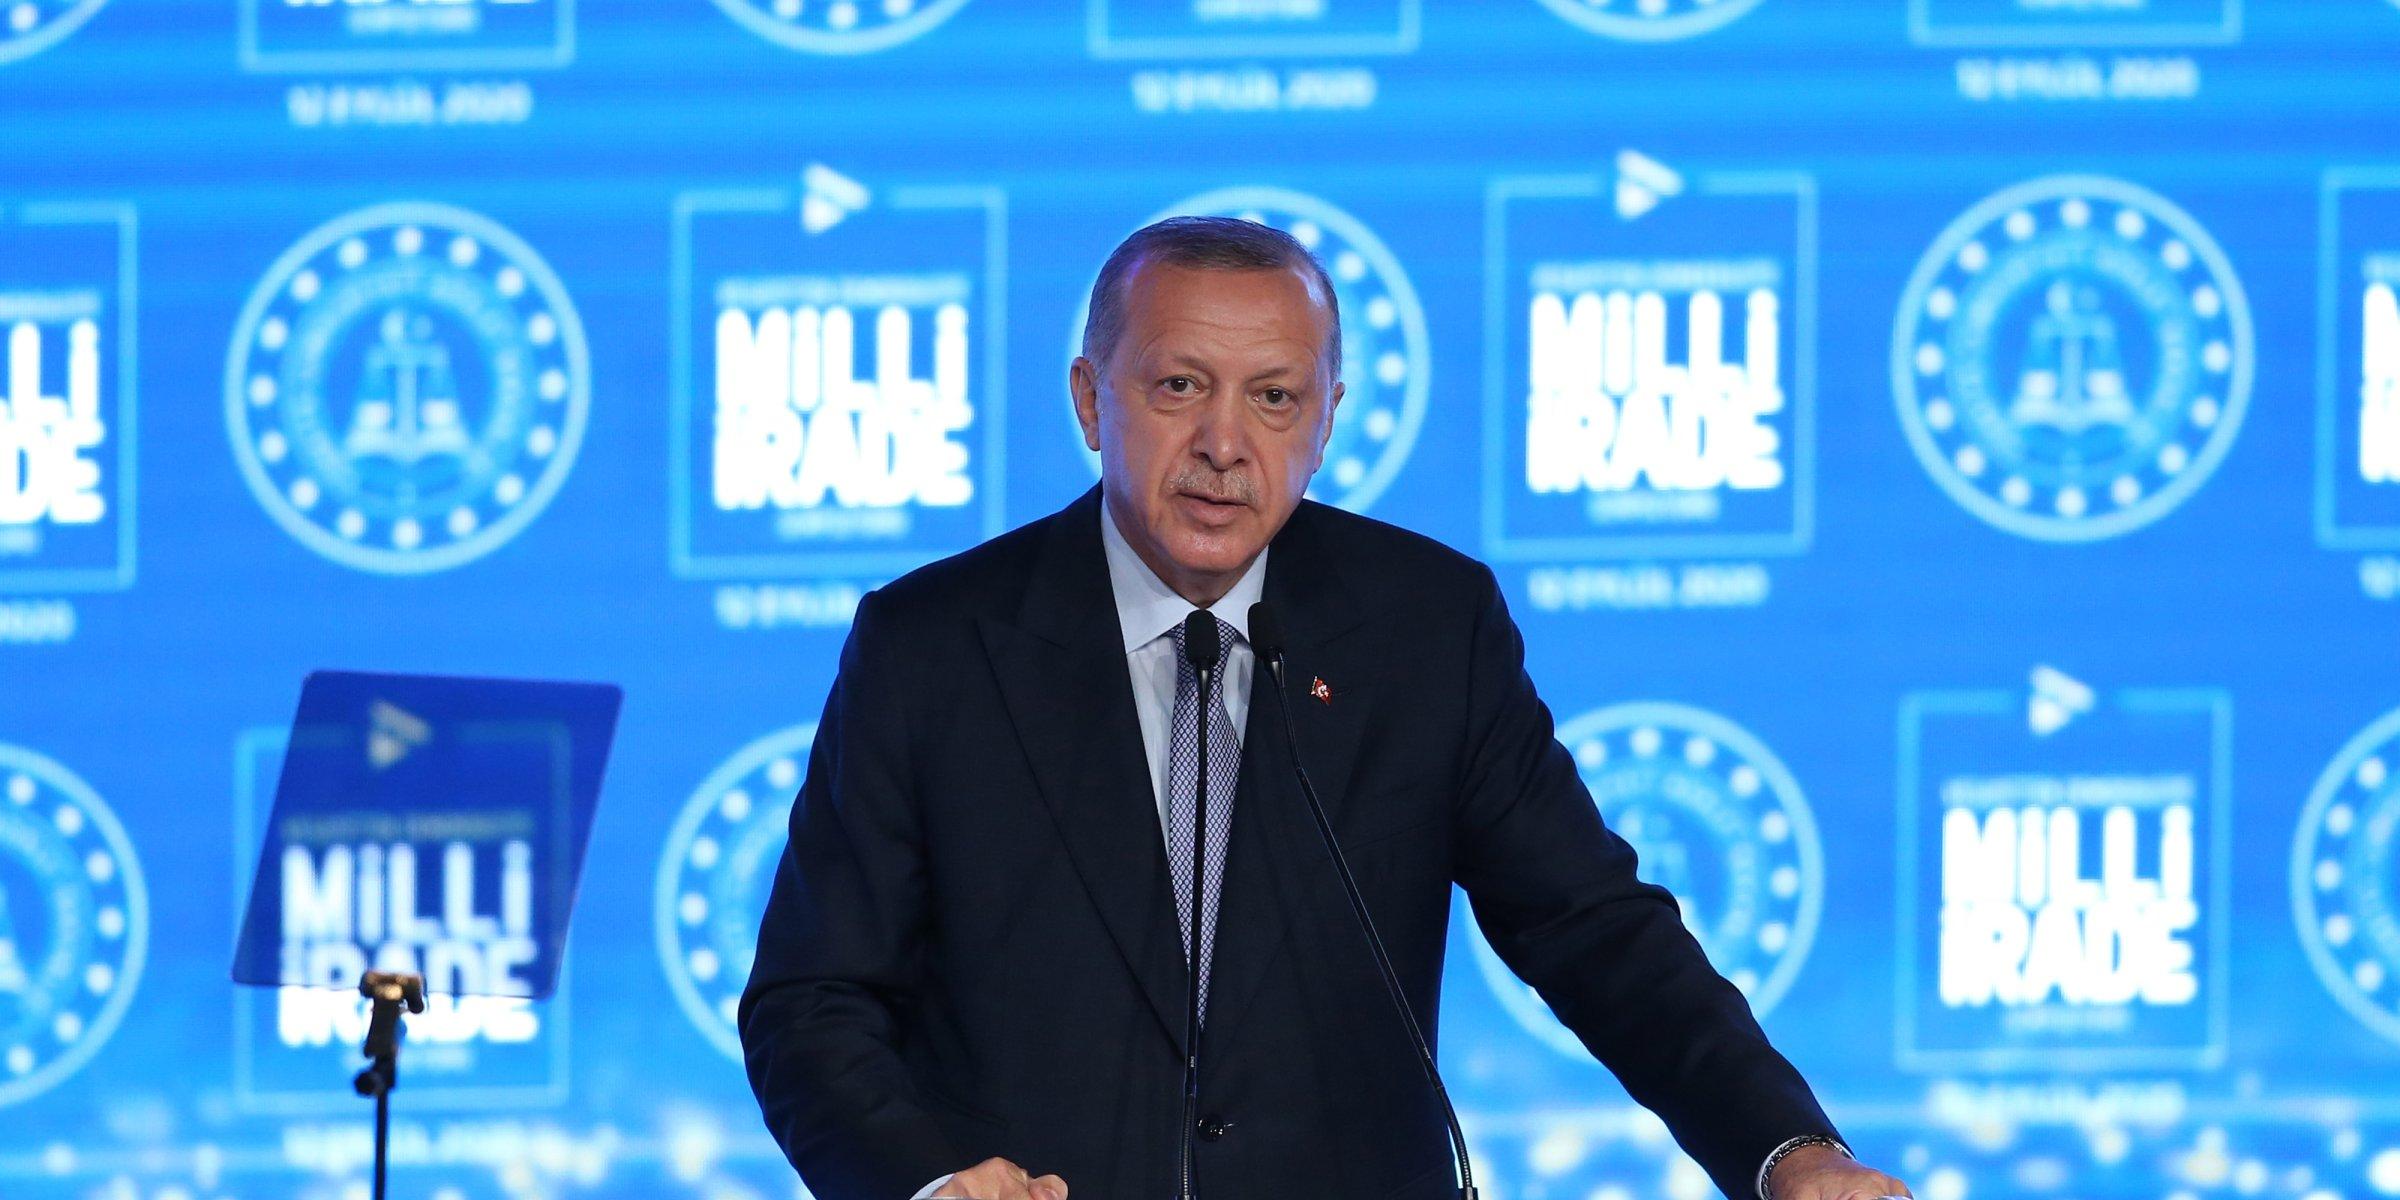 Credit agencies' ratings 'worthless,' Erdoğan says after Moody's downg... image